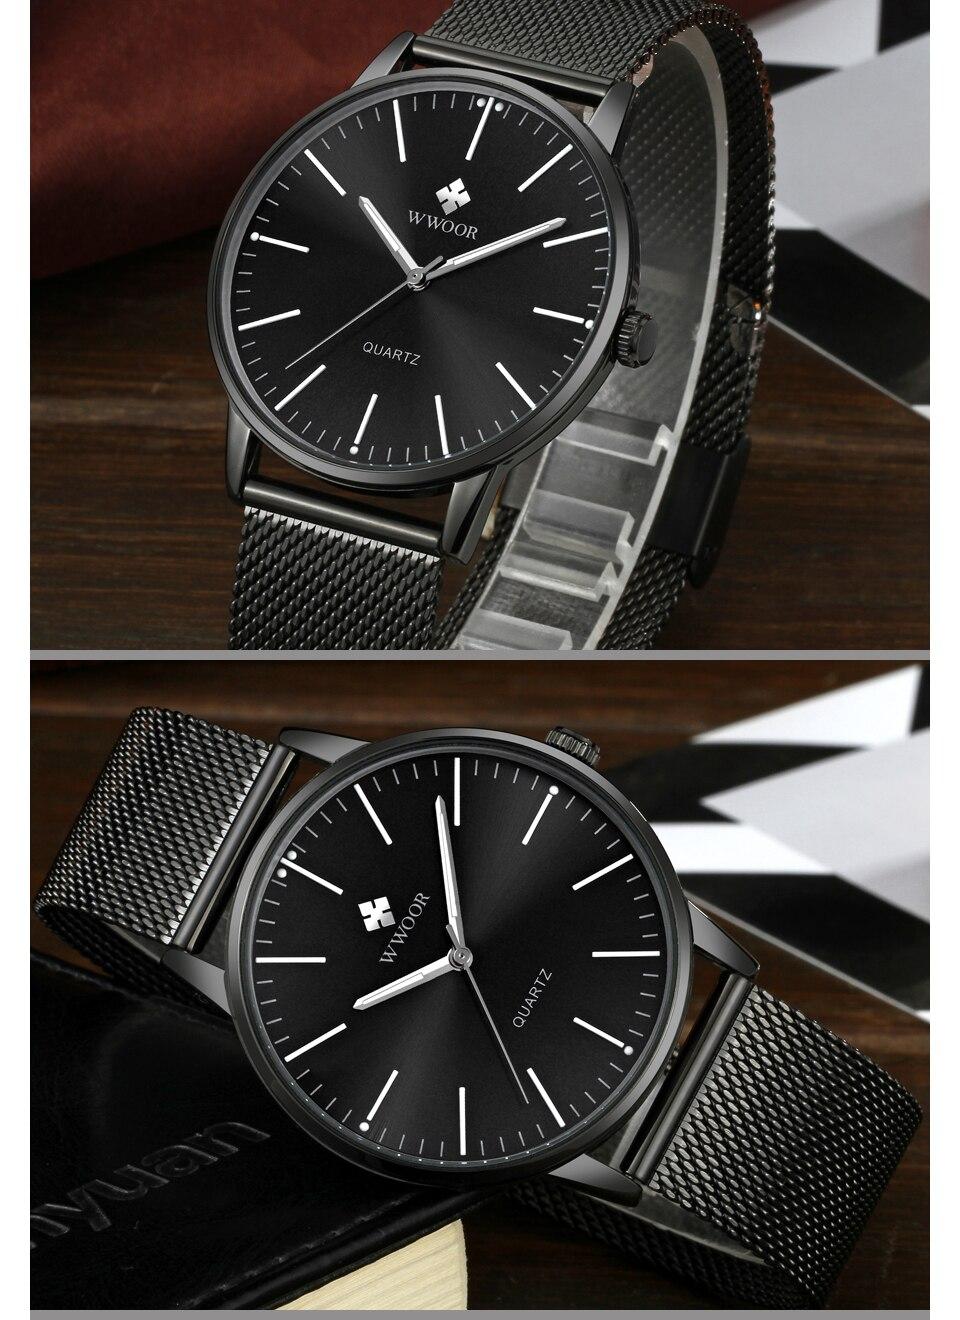 HTB1fMm8hOqAXuNjy1Xdq6yYcVXaW WWOOR Men Simple Slim Quartz Watch Gold Steel Mesh Ultra Thin Men Watches Luxury Brand Waterproof Male Wrist Watch Golden Clock